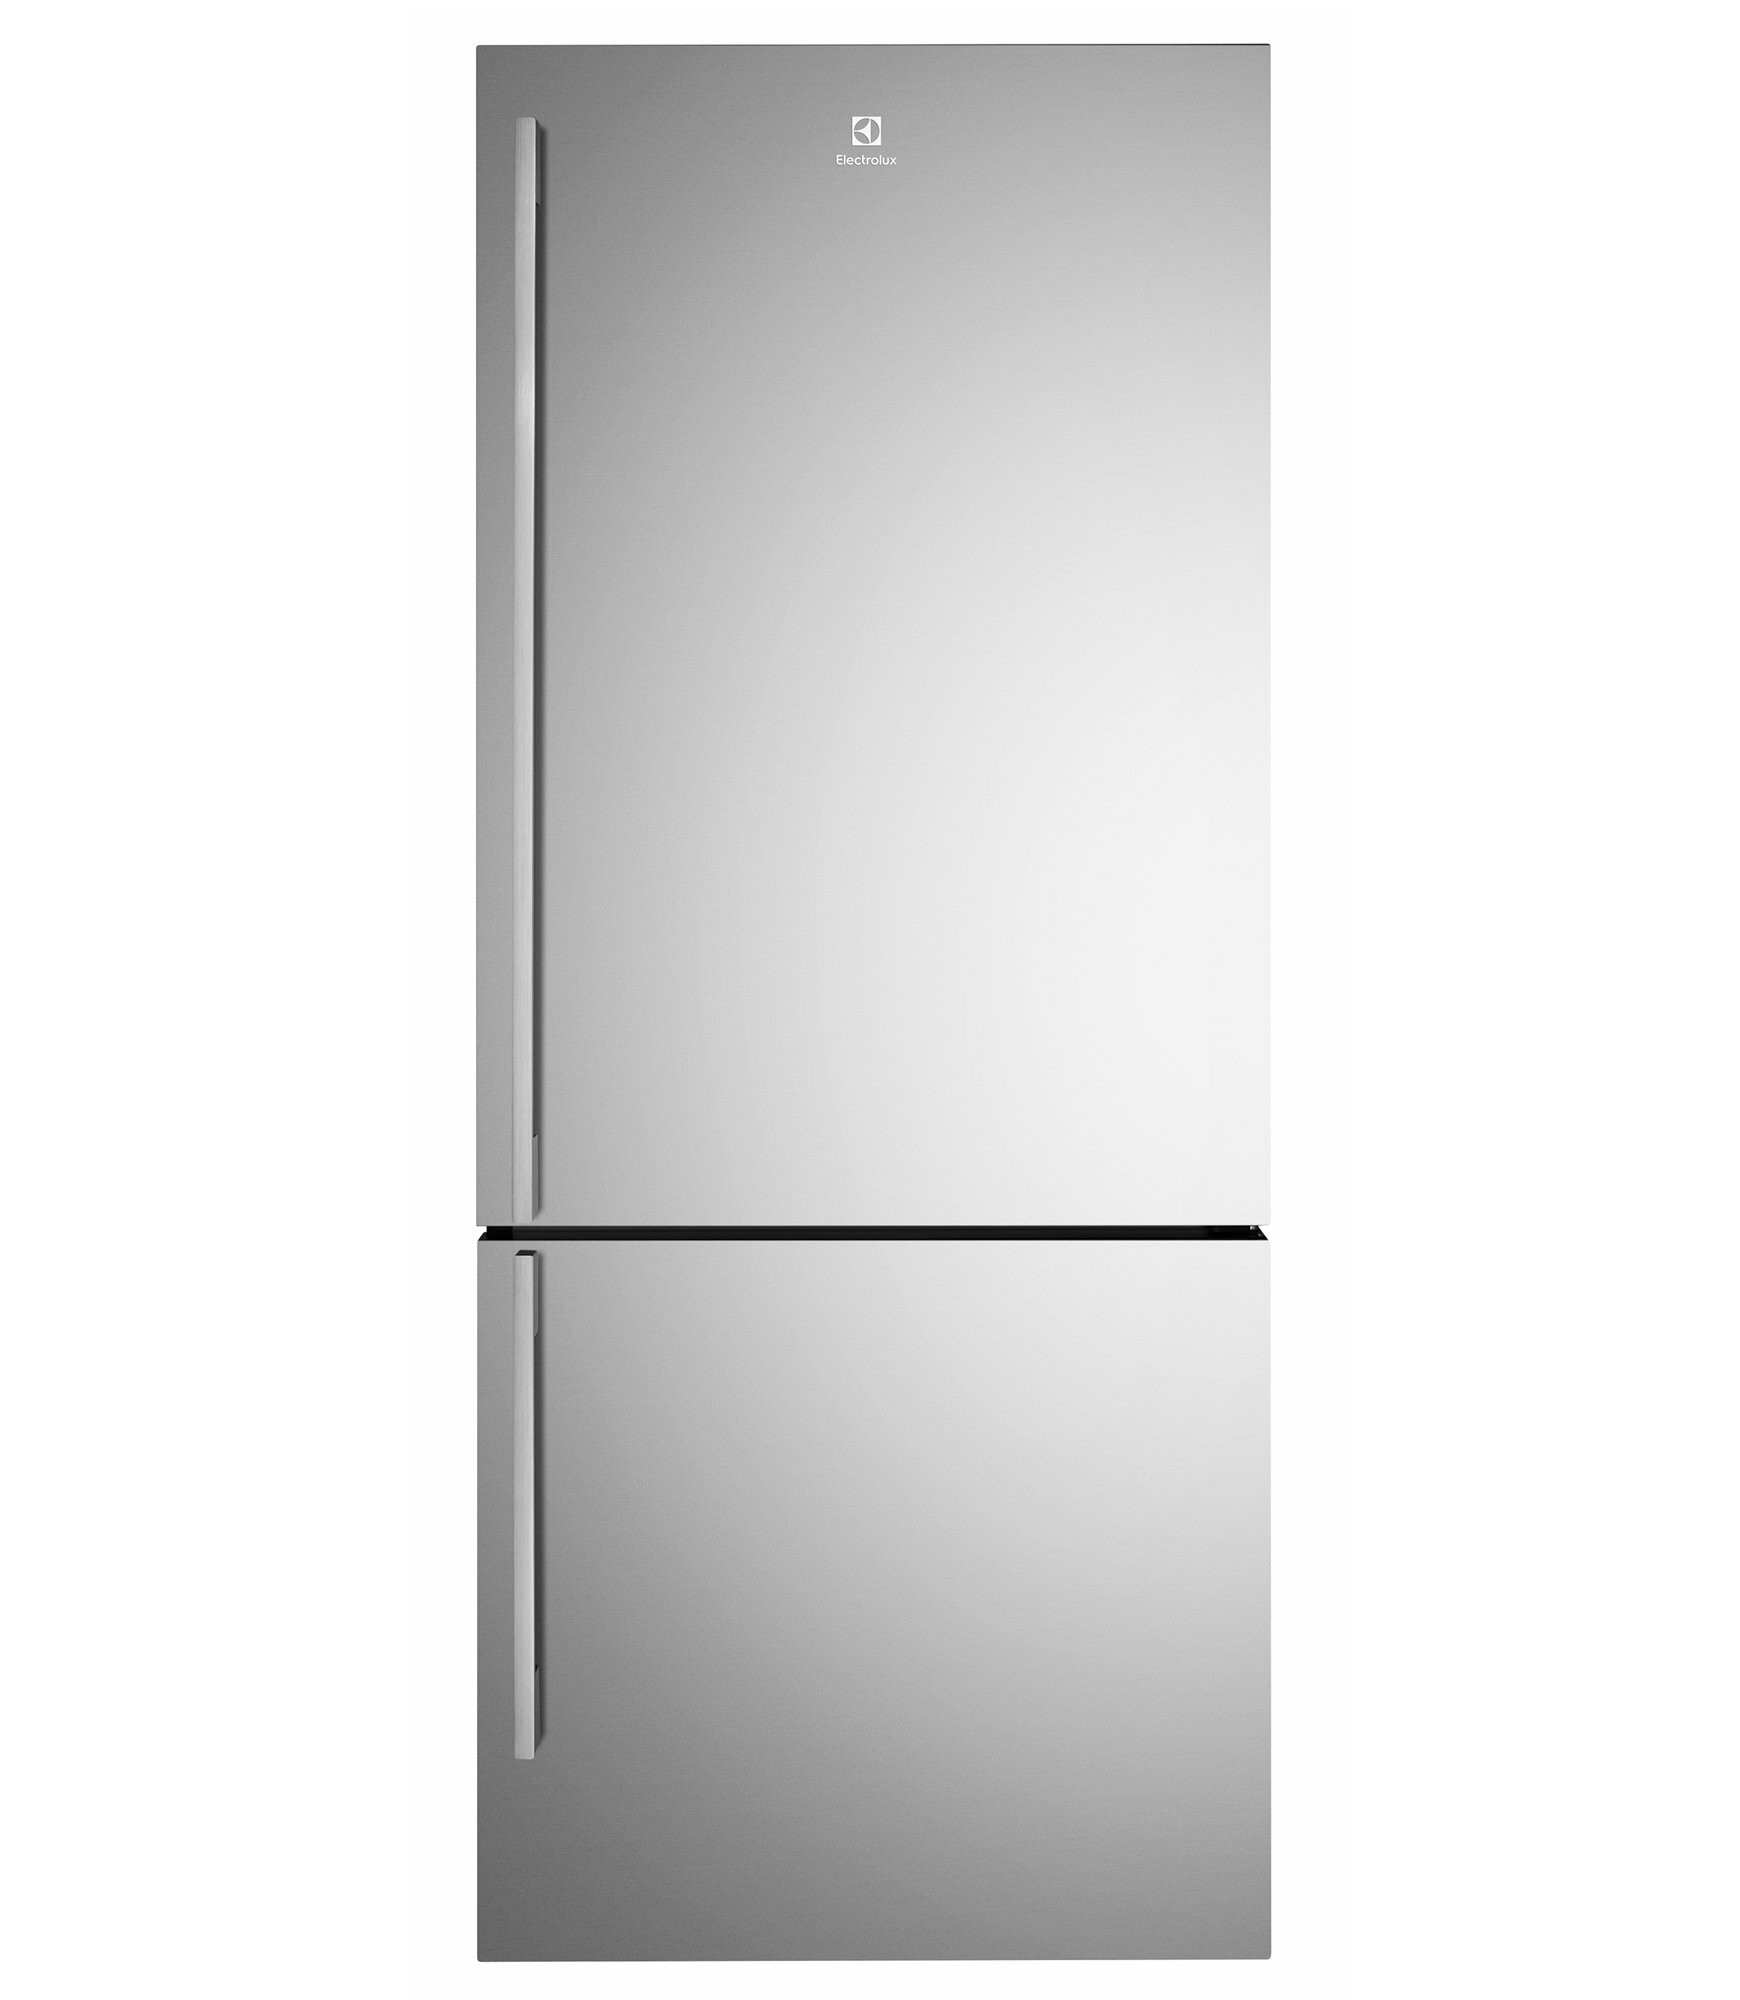 Electrolux EBE5307SC-R Refrigerator